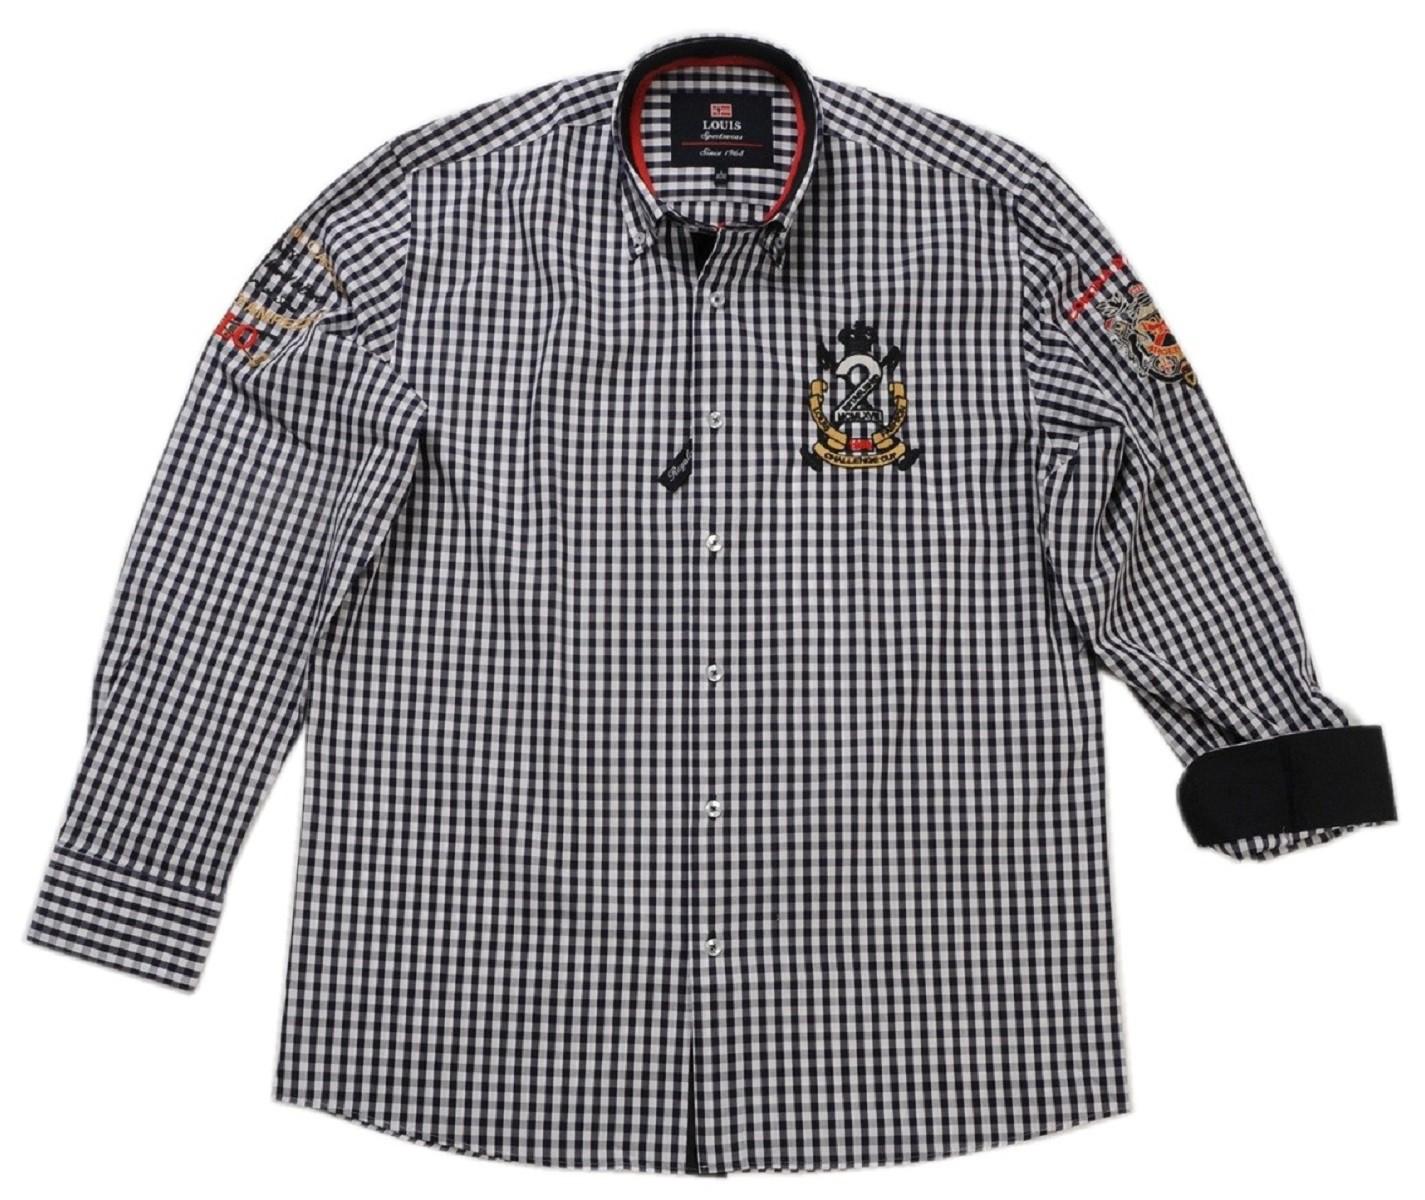 finest selection 9a8ea 4bc59 Tobeni Herren Marken Hemd mit Langarm Casual-Style in ...